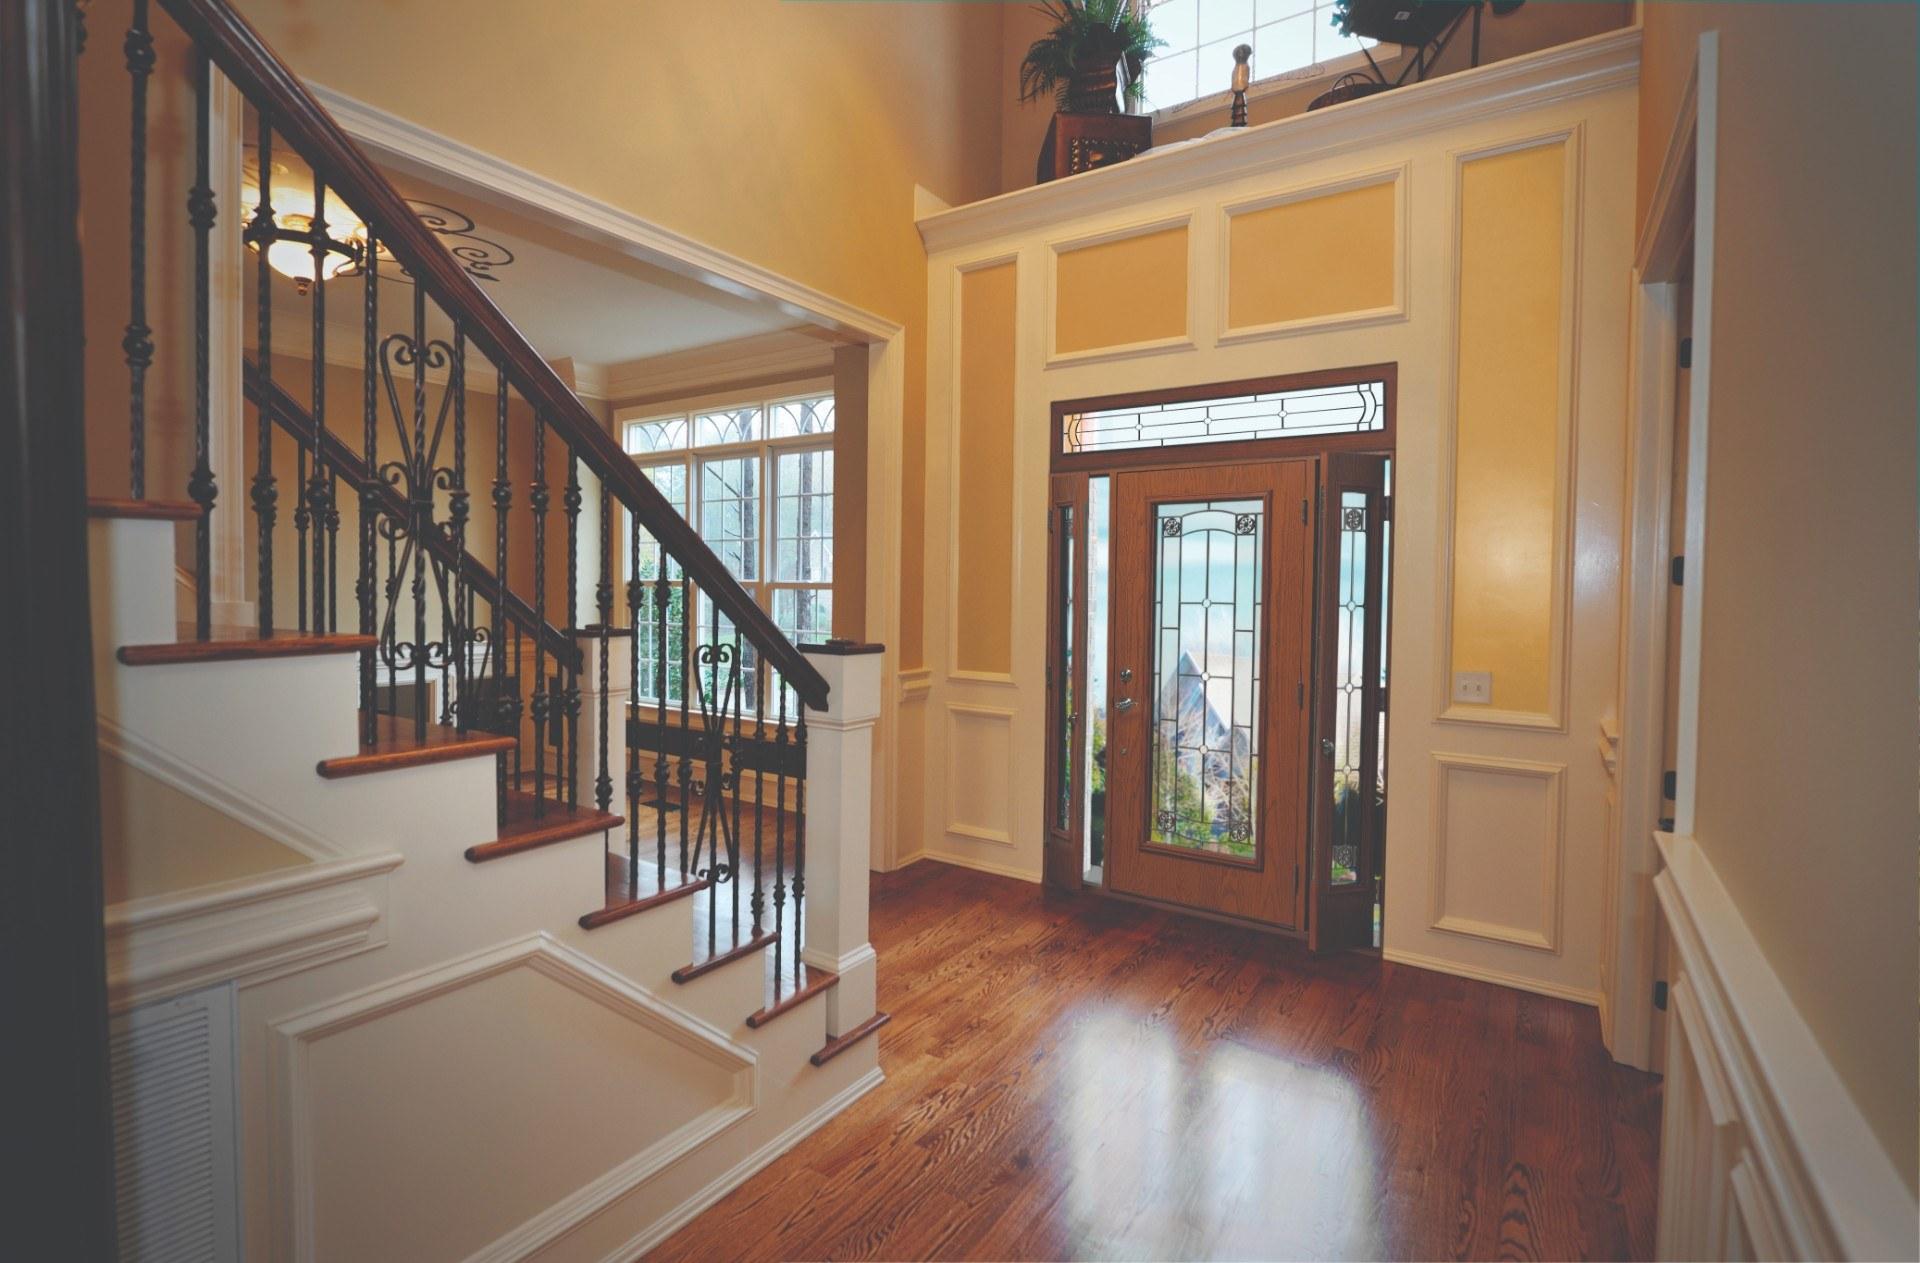 Entry Door Hi Rez B Edited Pixlr